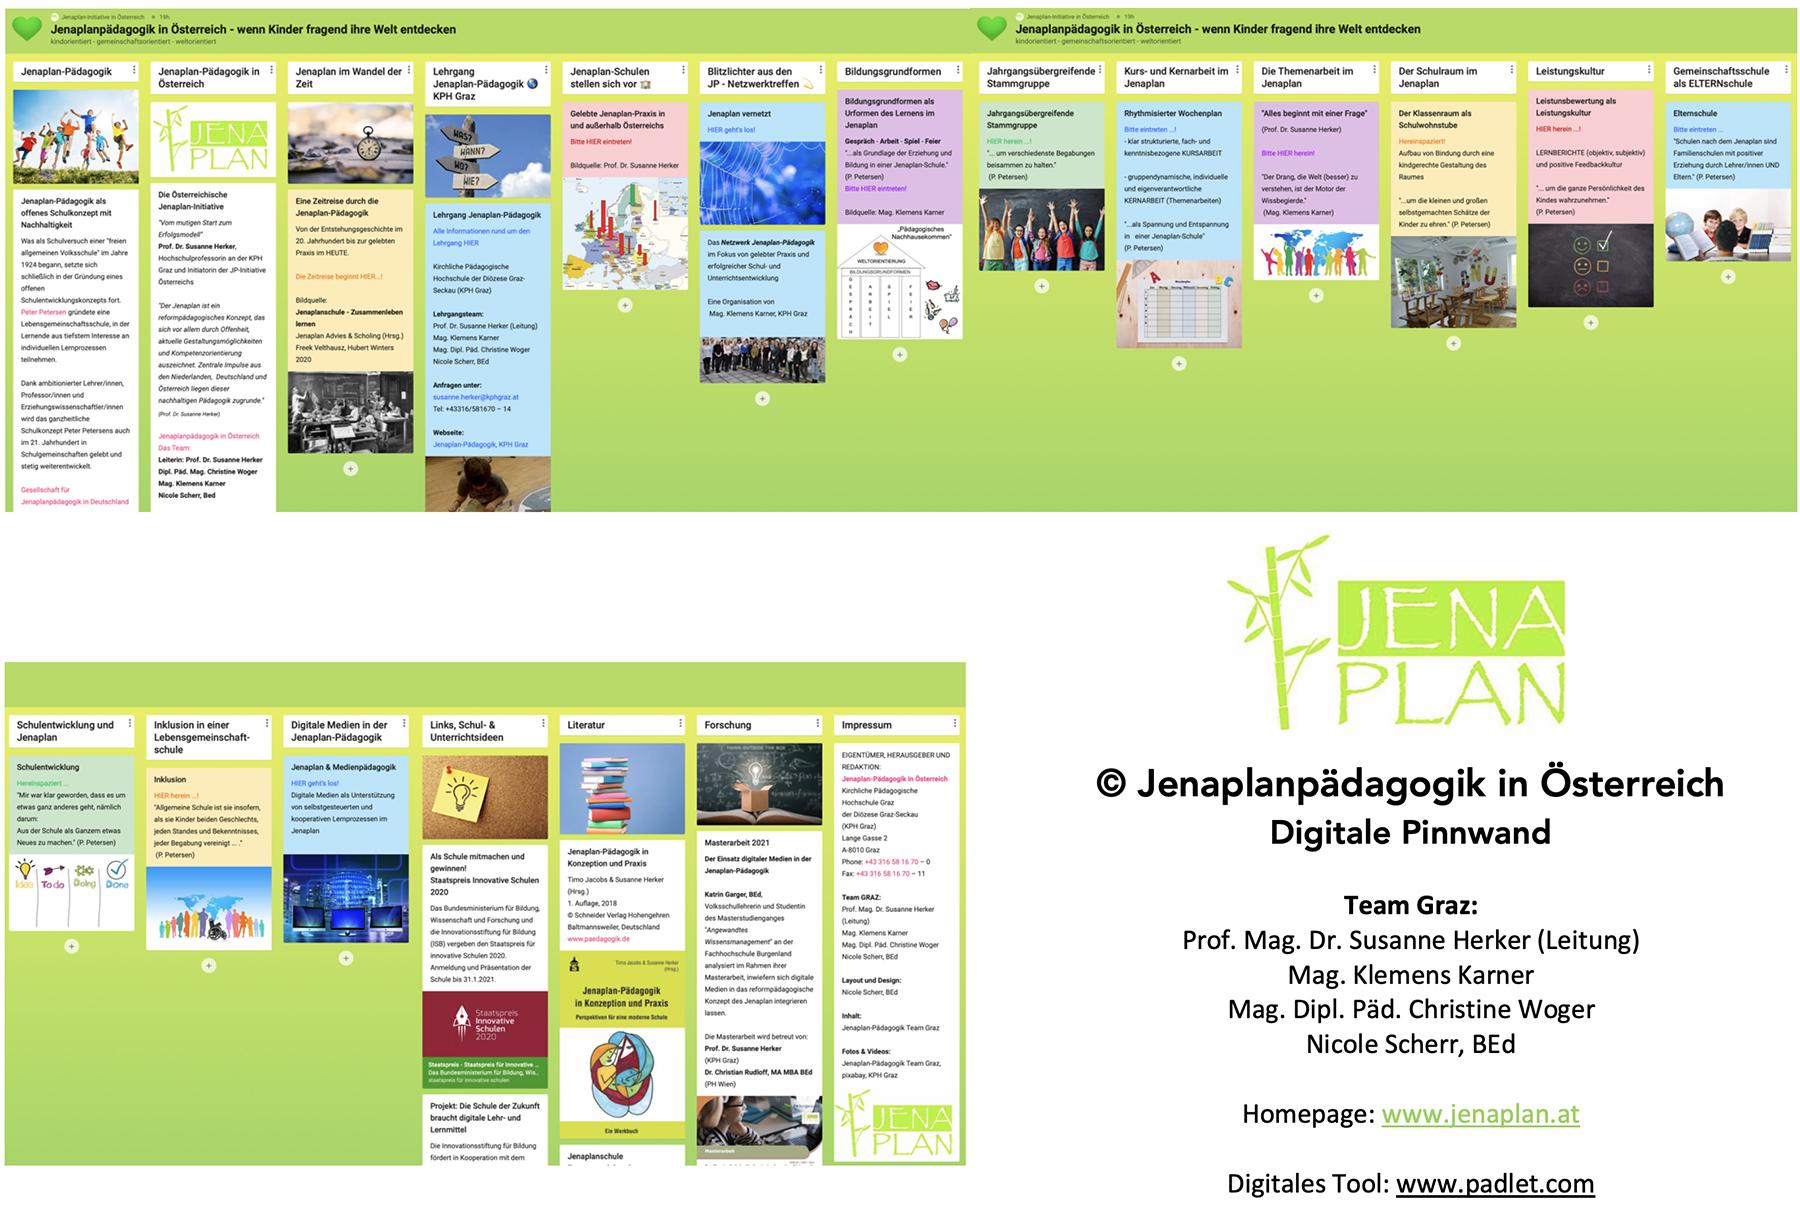 Digitale Pinnwand Jenaplanpädagogik in Österreich